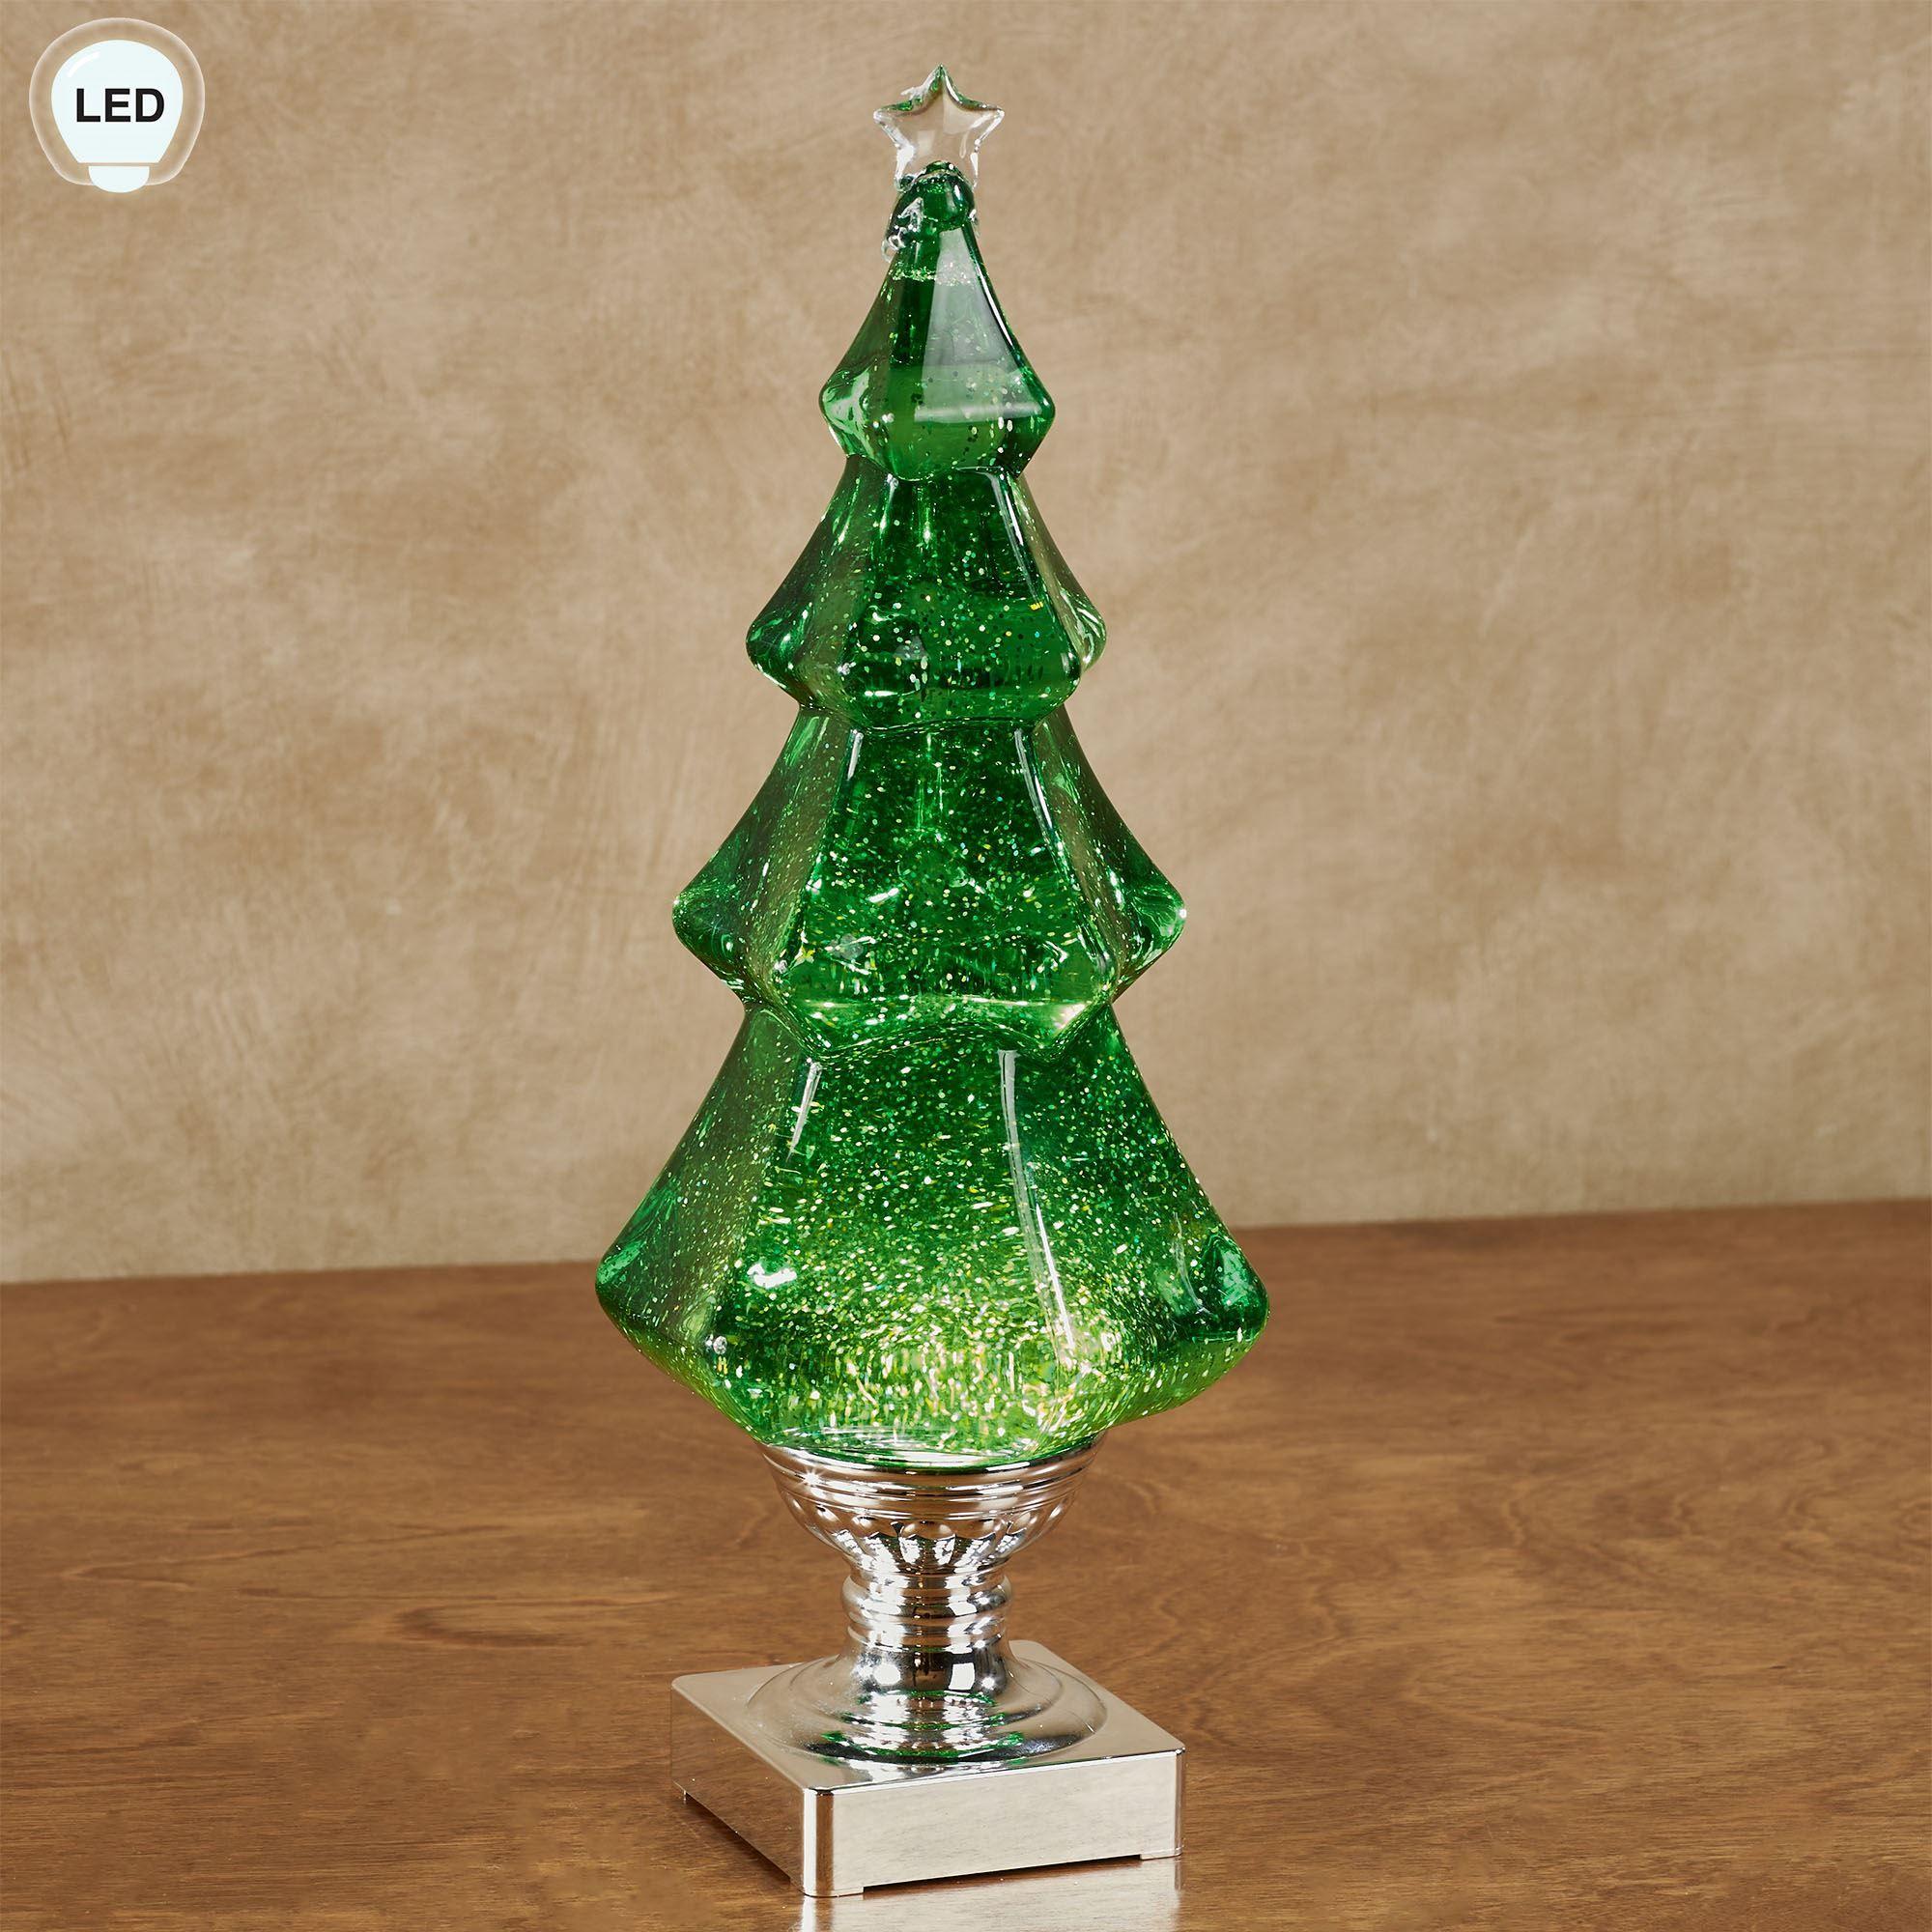 Lighted Christmas Tree.Swirl Led Lighted Christmas Tree Figurine By Roman